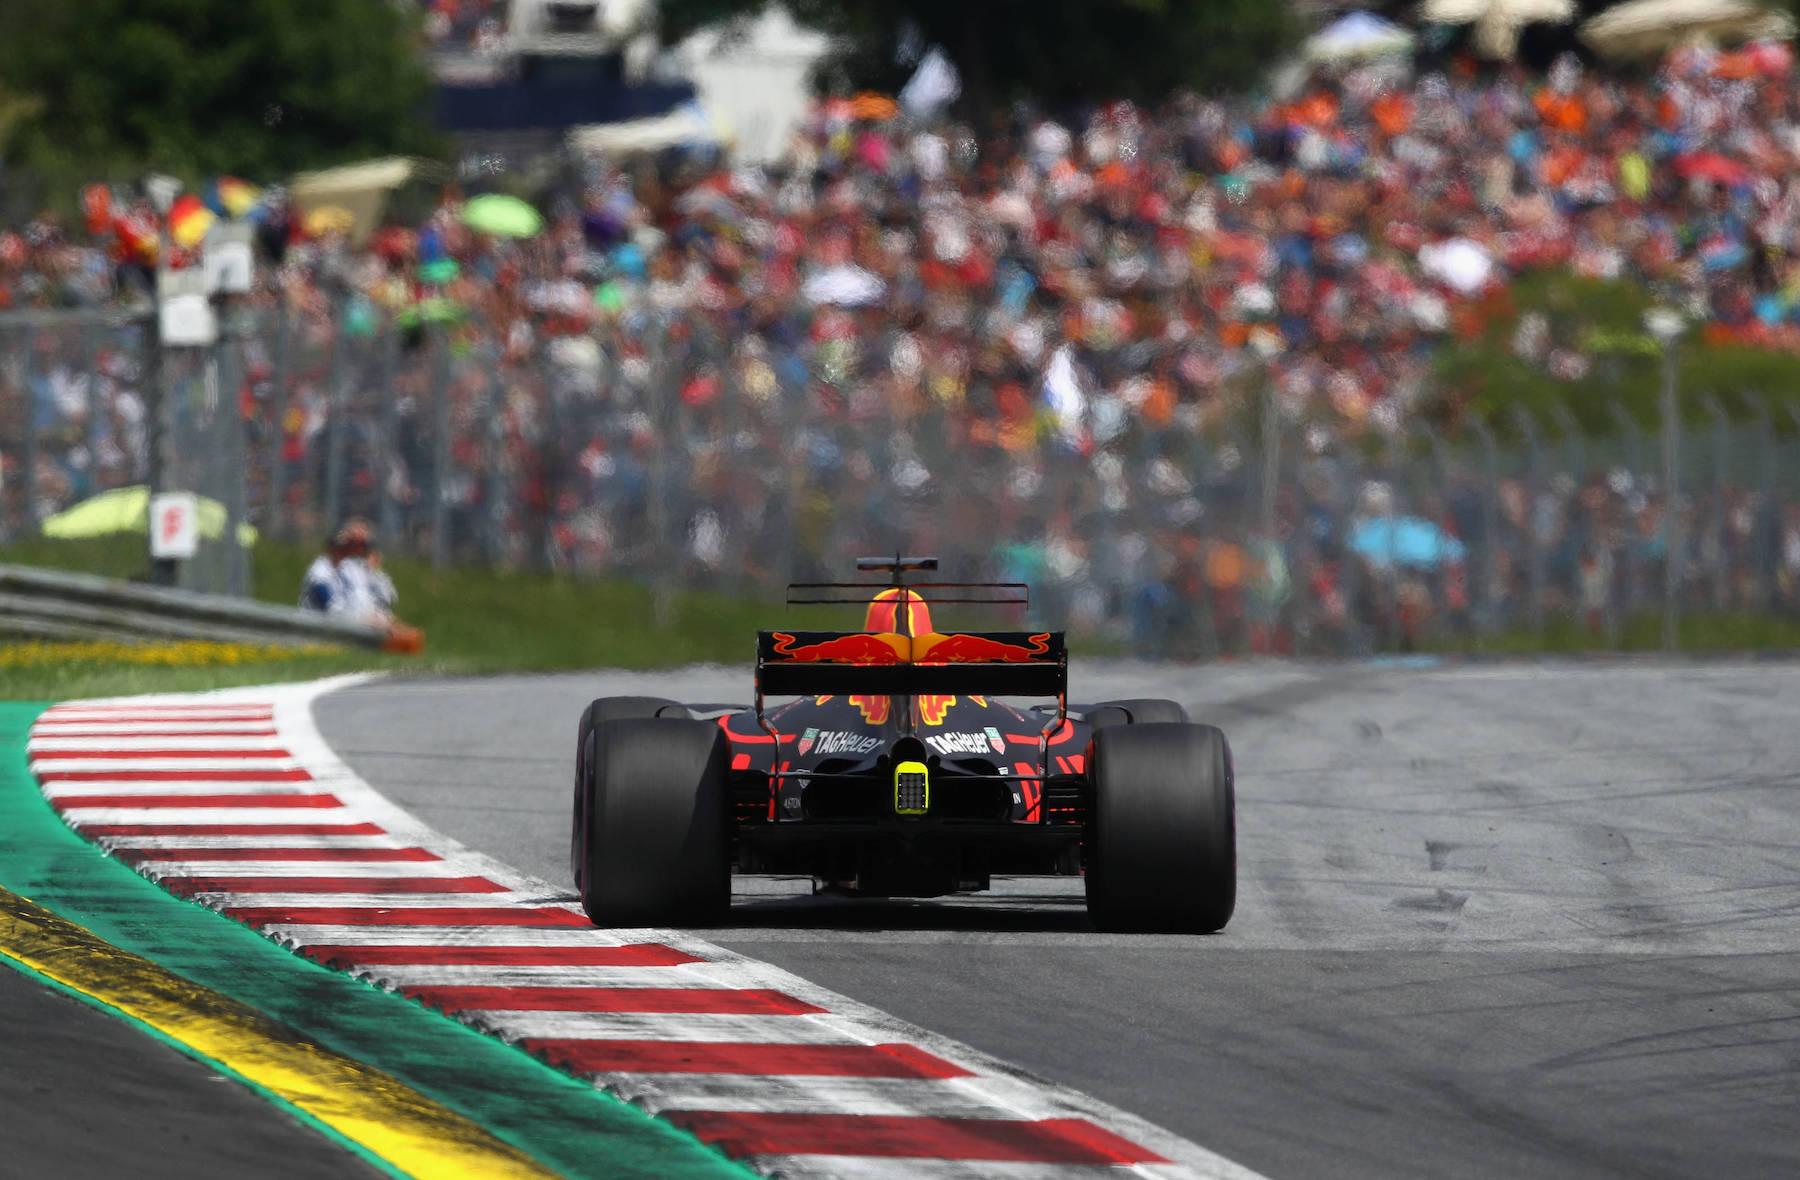 G 2017 Daniel Ricciardo | Red Bull RB13 | 2017 Austrian GP P3 1 copy.jpg